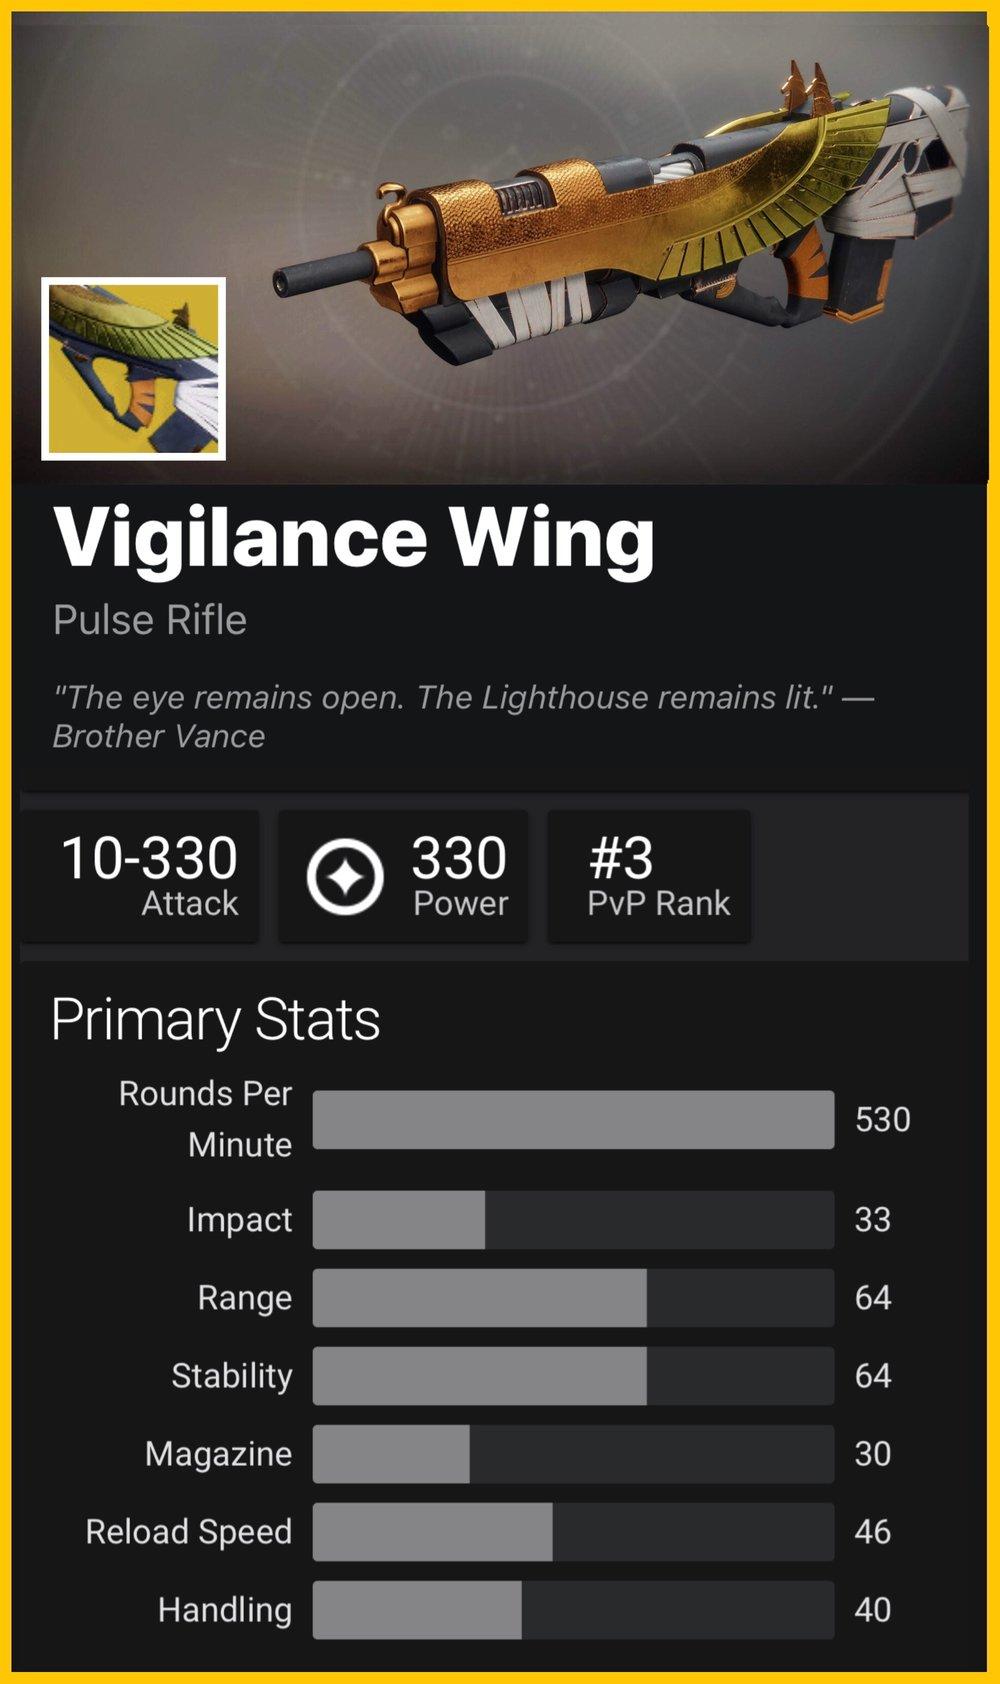 Vigilance Wing.JPEG